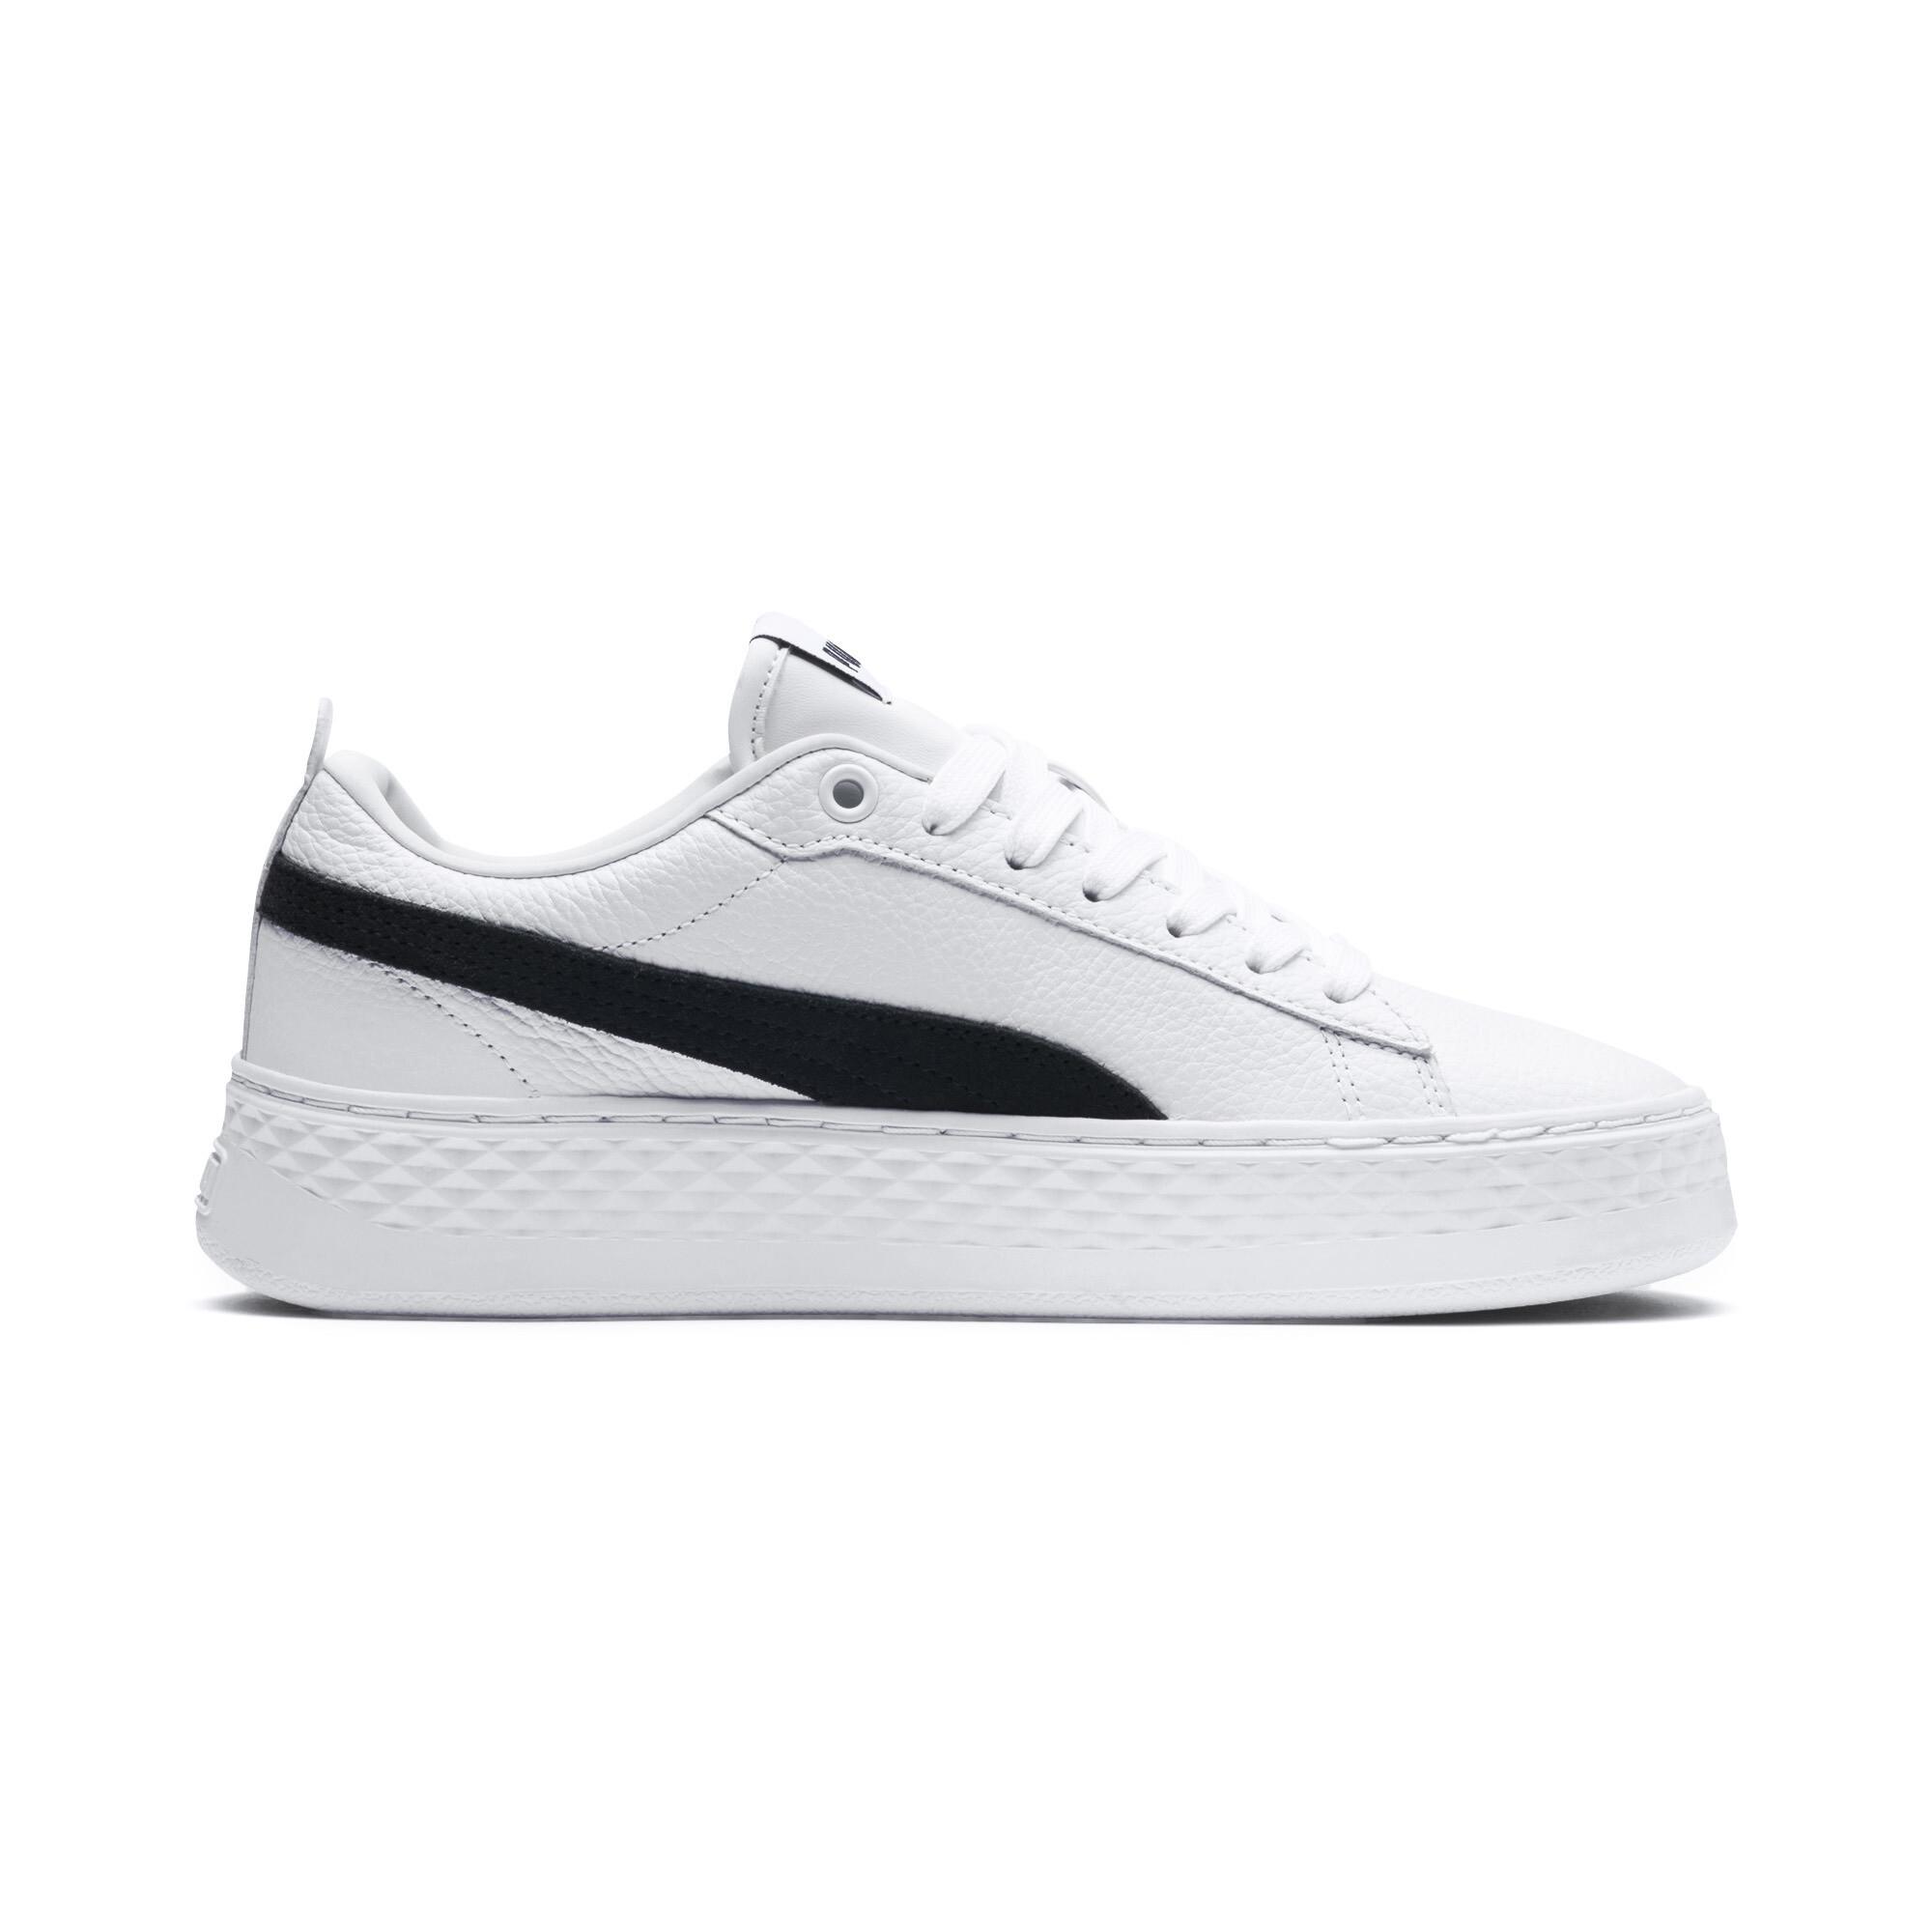 PUMA-Smash-Platform-Leather-Women-039-s-Sneakers-Women-Shoe-Basics thumbnail 16